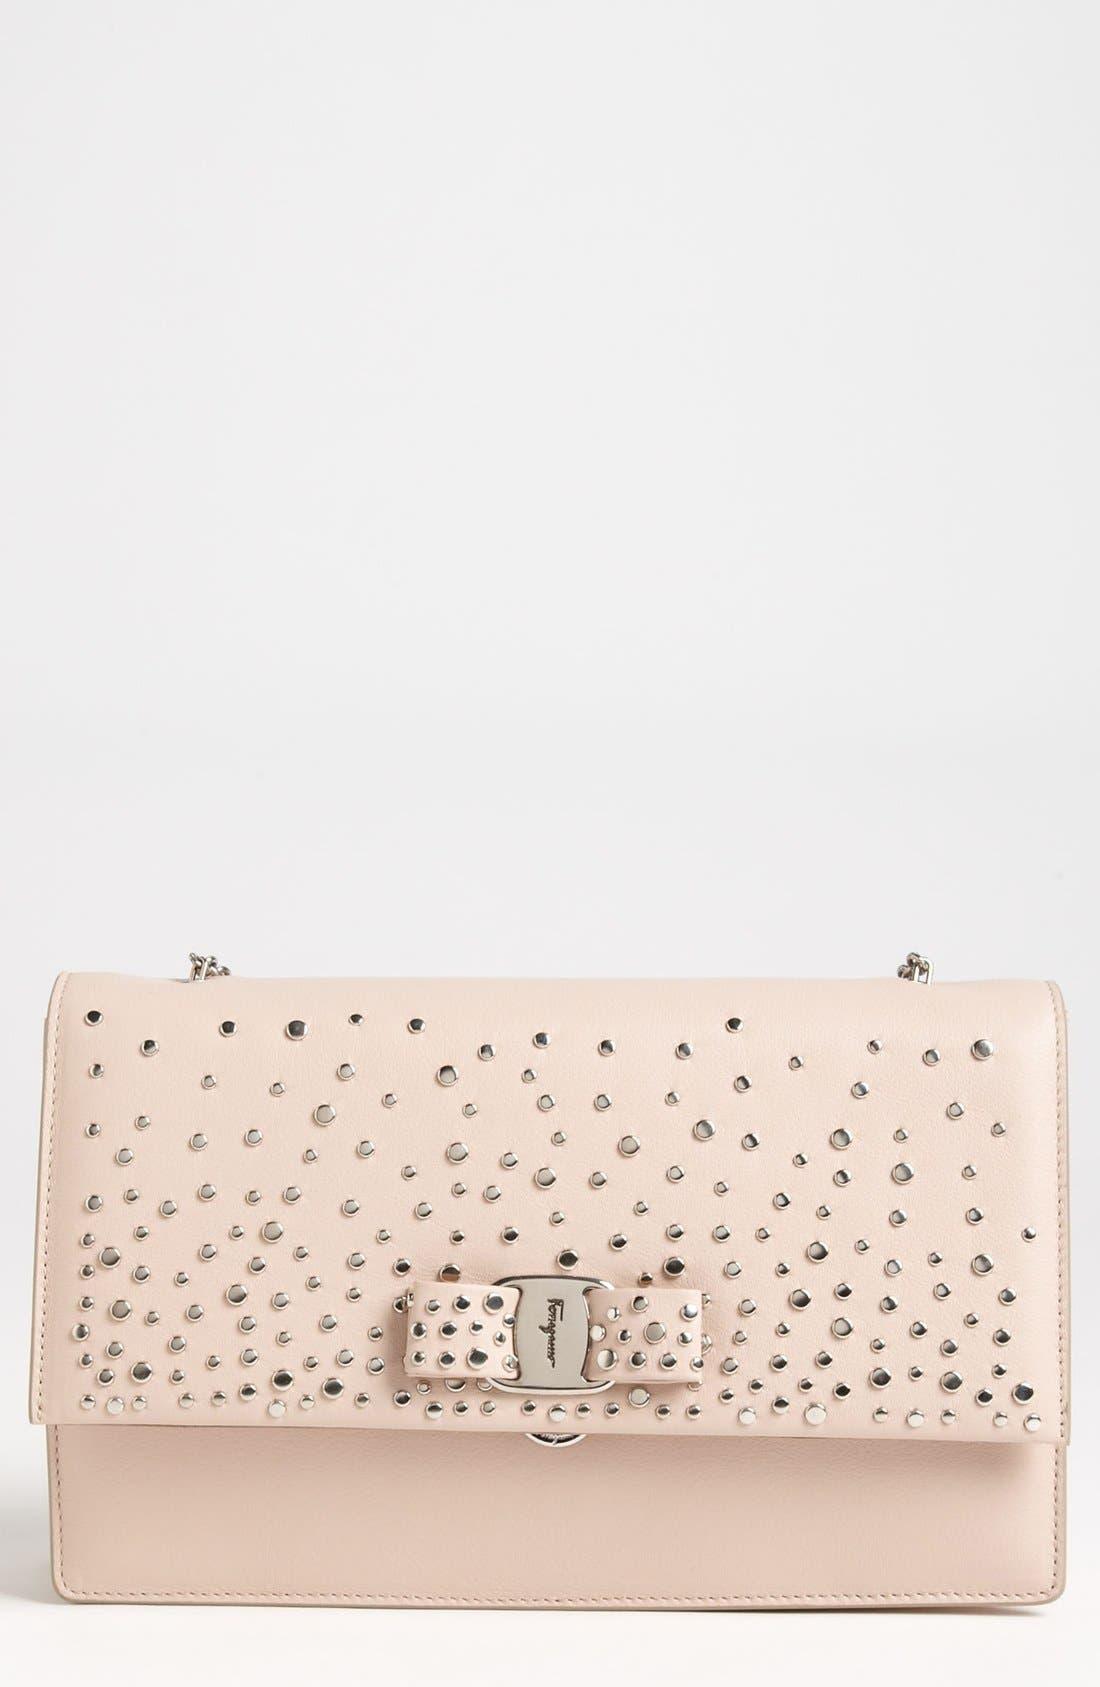 Main Image - Salvatore Ferragamo 'Louvre Ginny - Mini' Leather Shoulder Bag